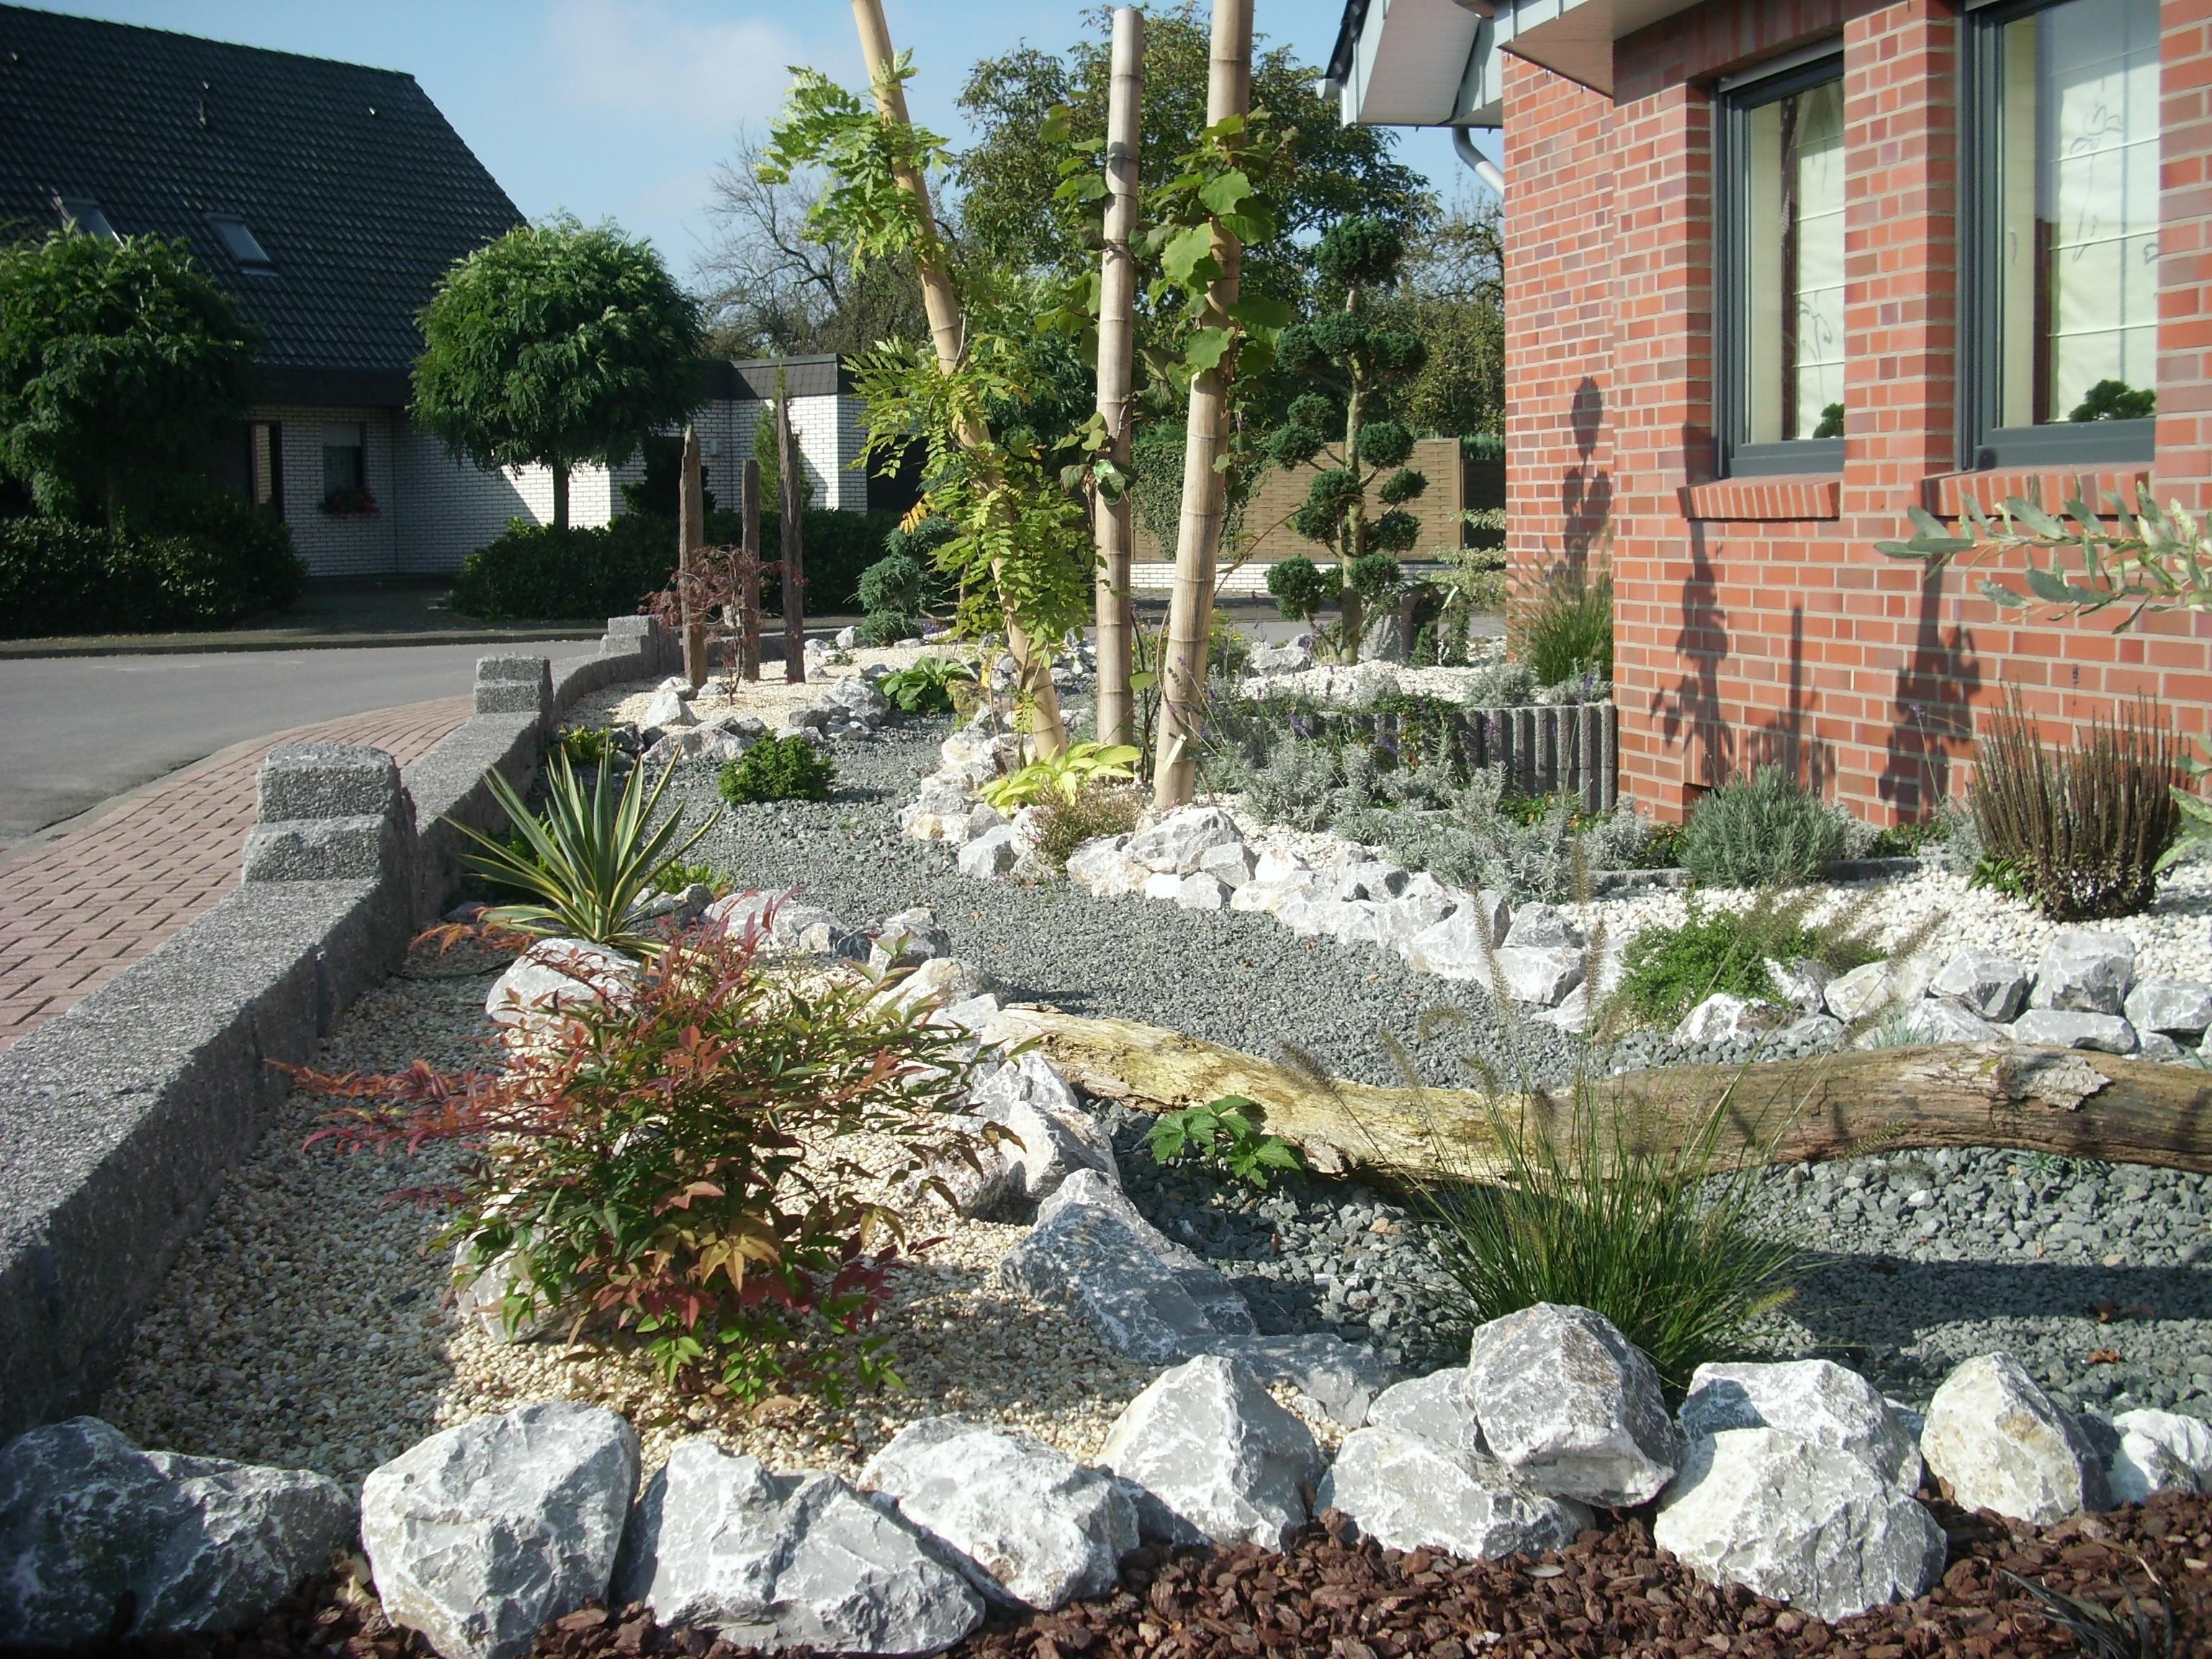 Inspirierend Gartengestaltung Kies Design